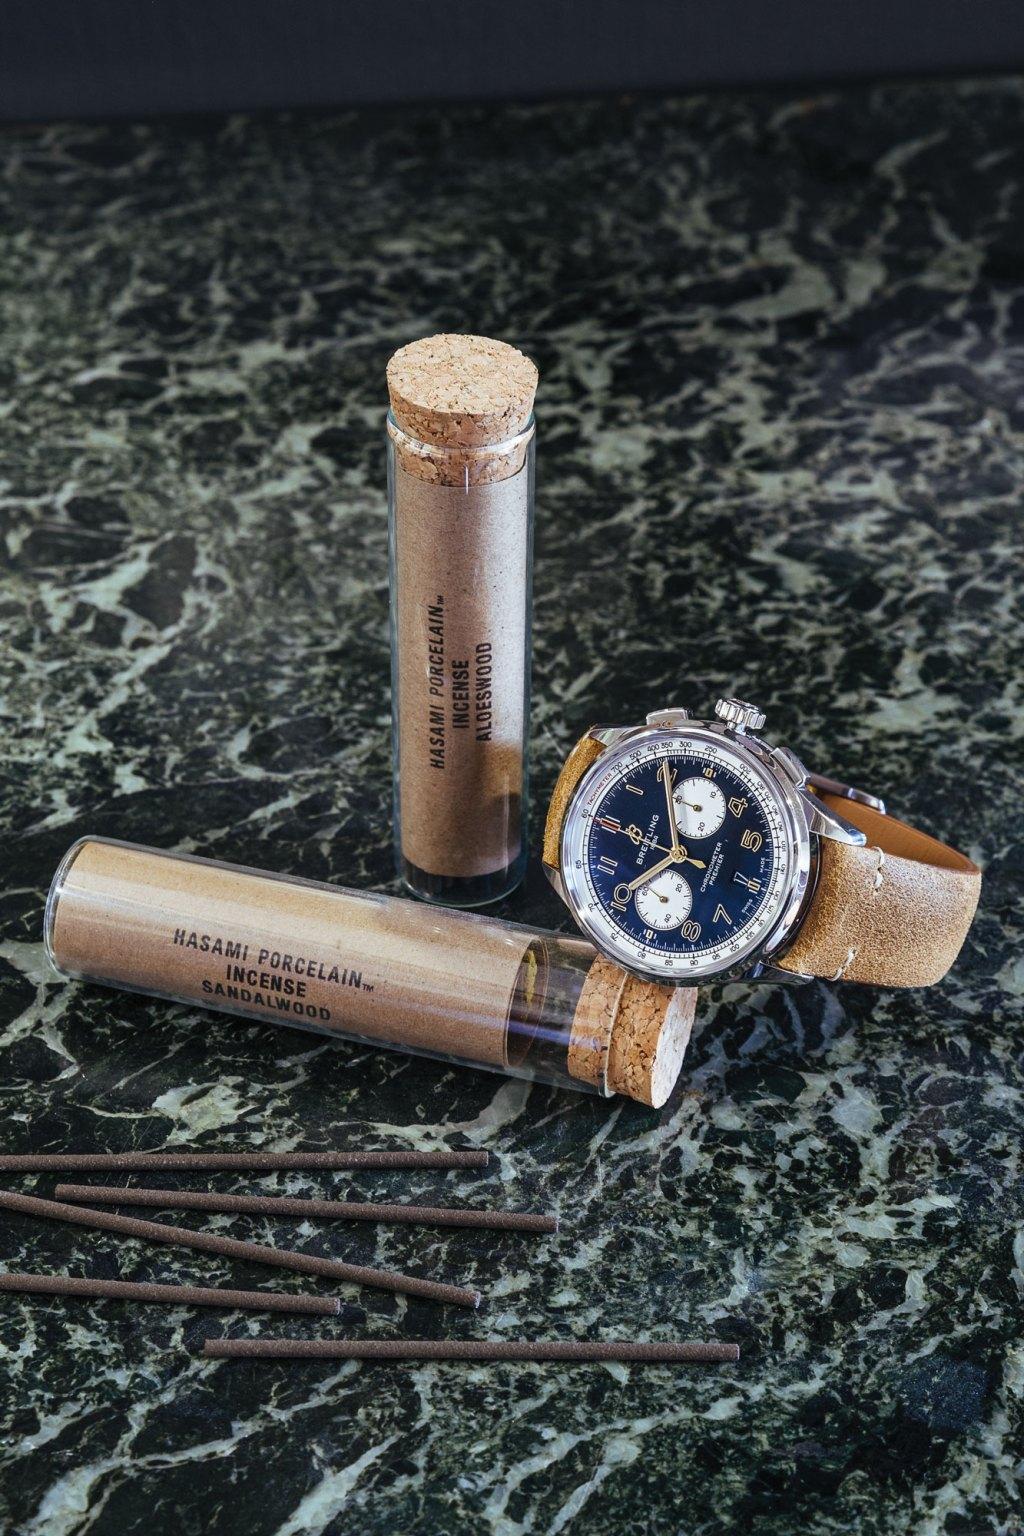 sixtysix mag Breitling Premier B01 Chronograph 42 Norton Edition hasami porcelan incense